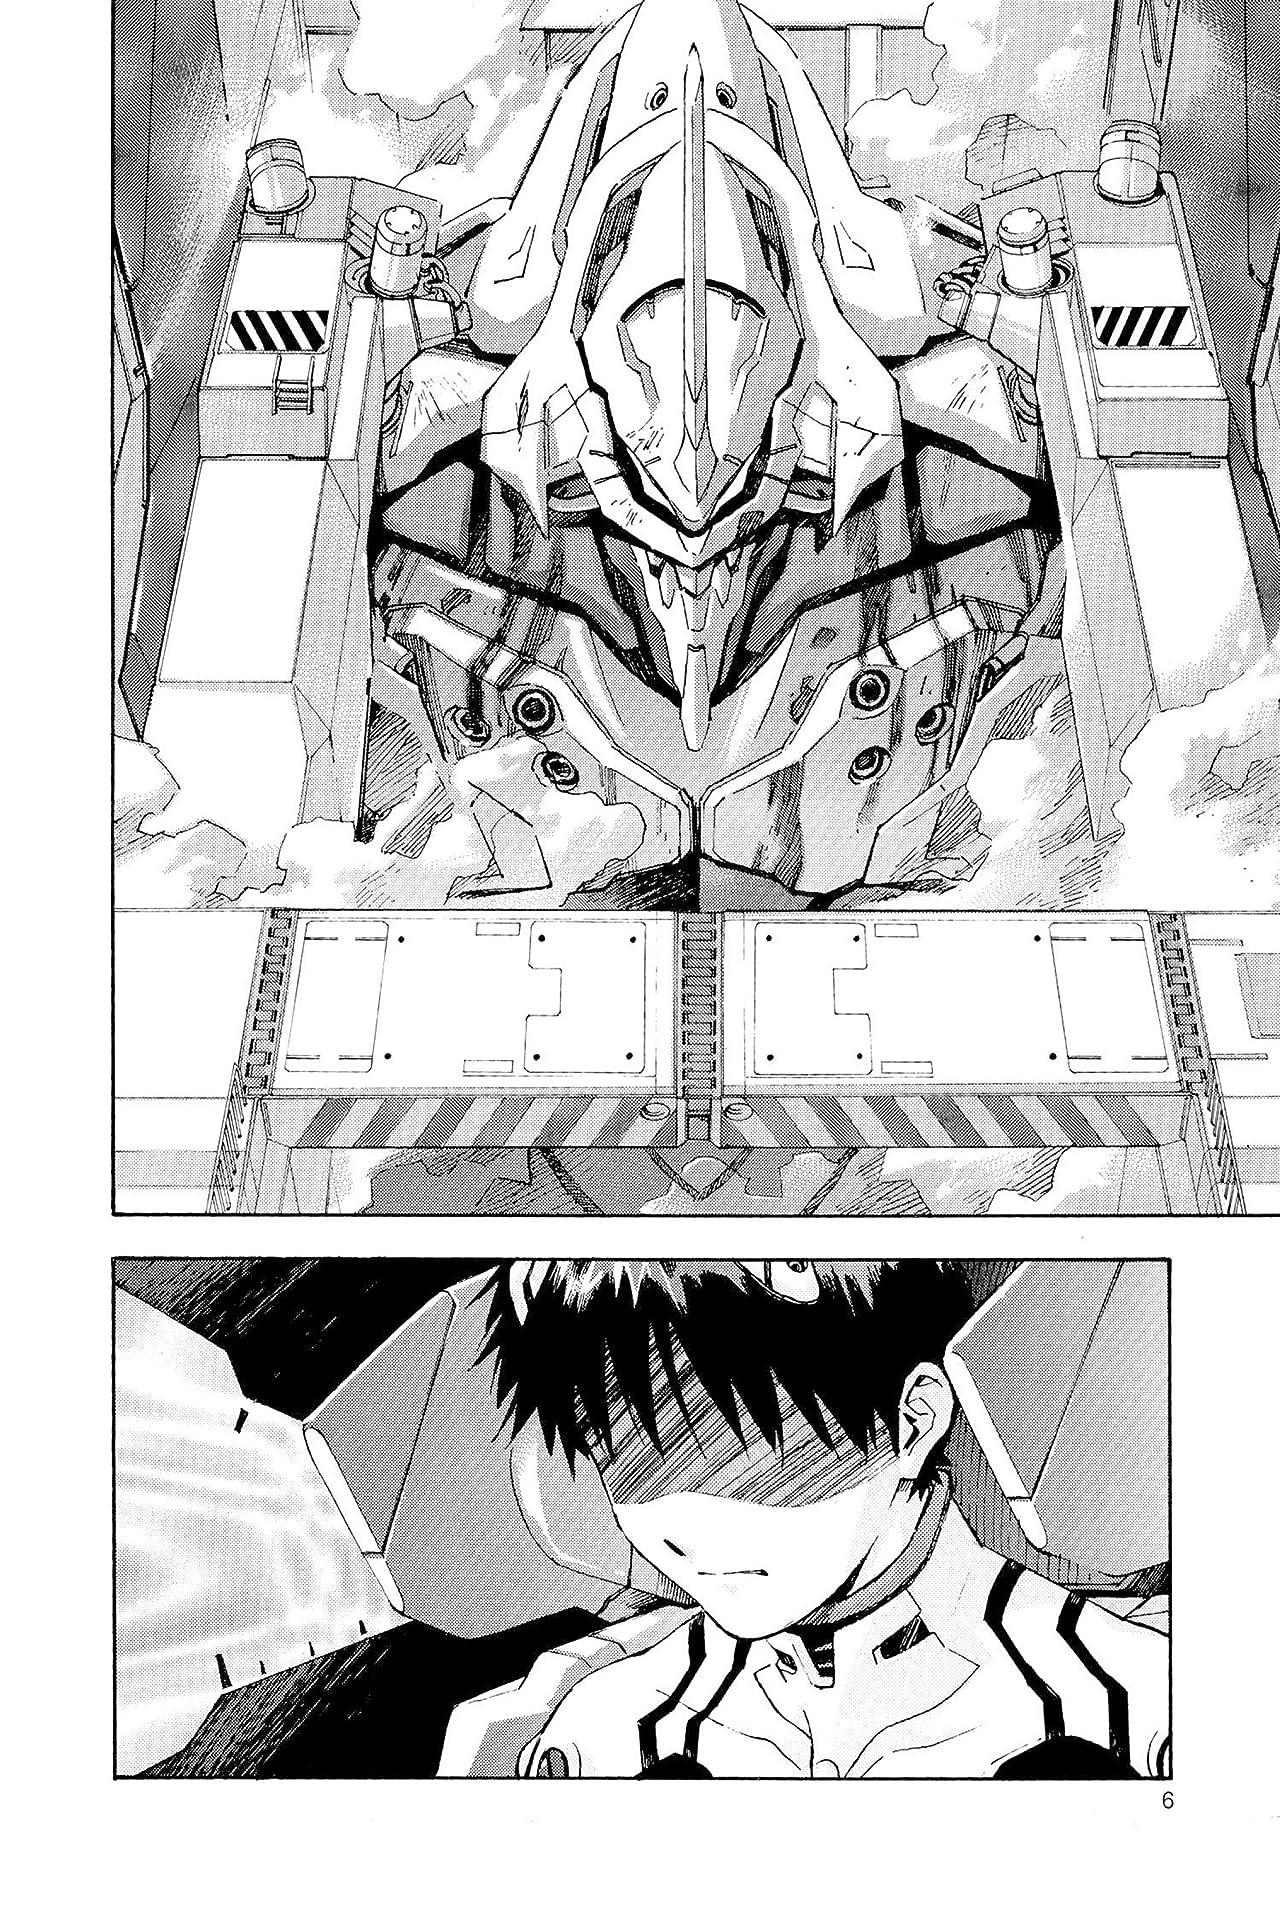 Neon Genesis Evangelion Vol. 7